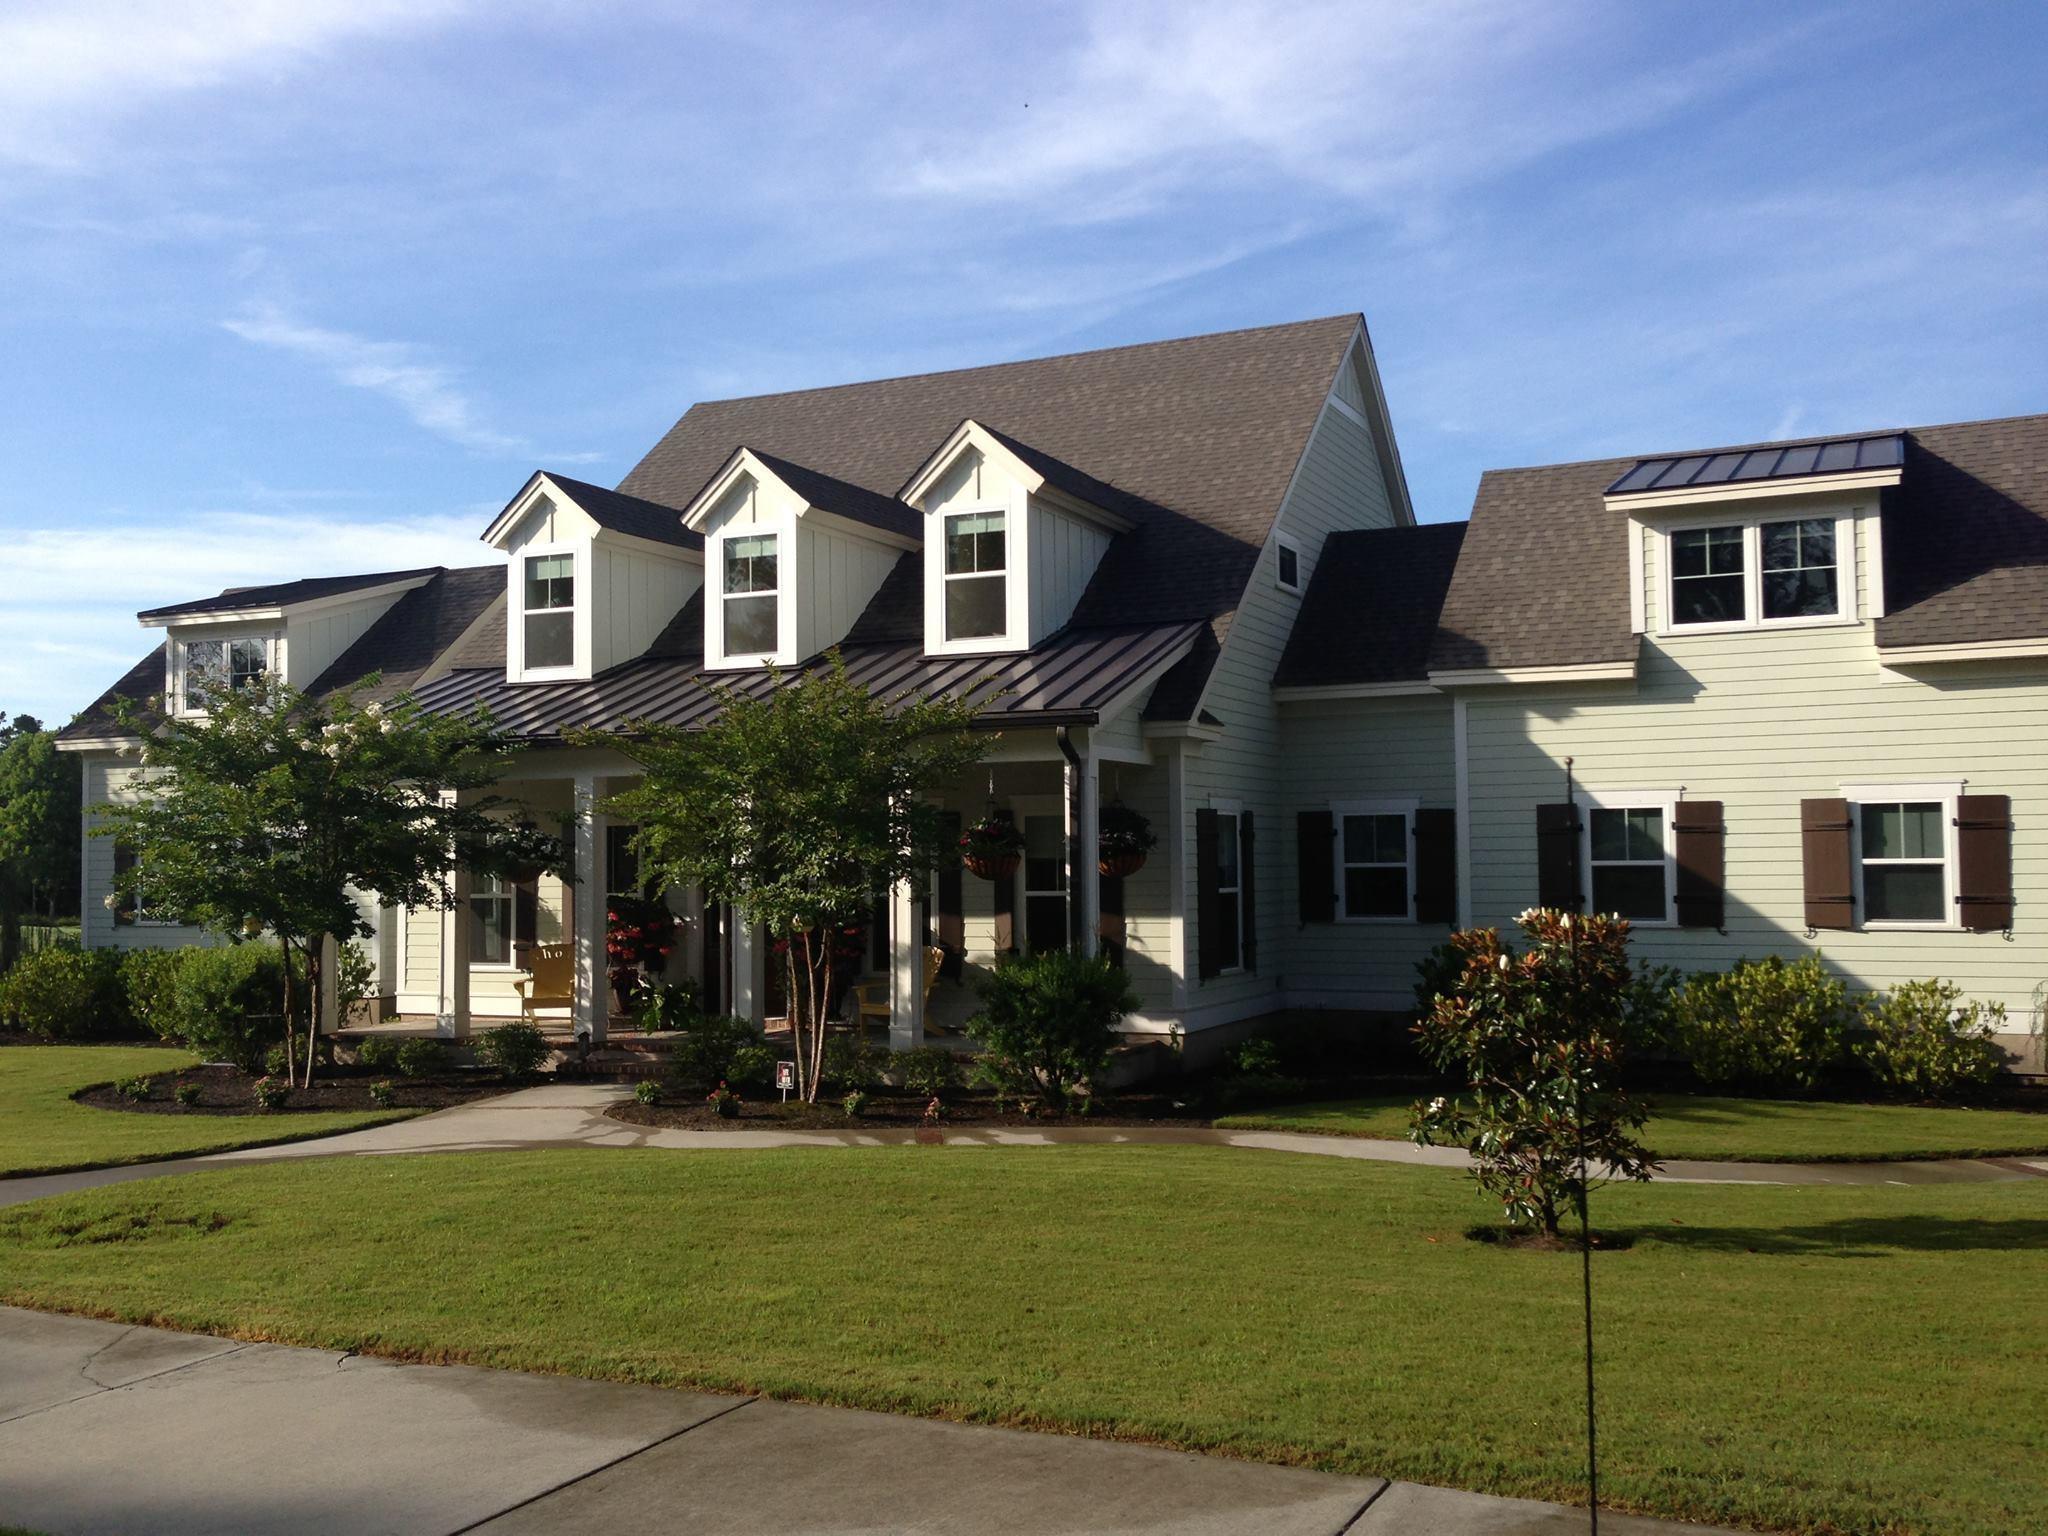 RoofCrafters-Savannah image 81